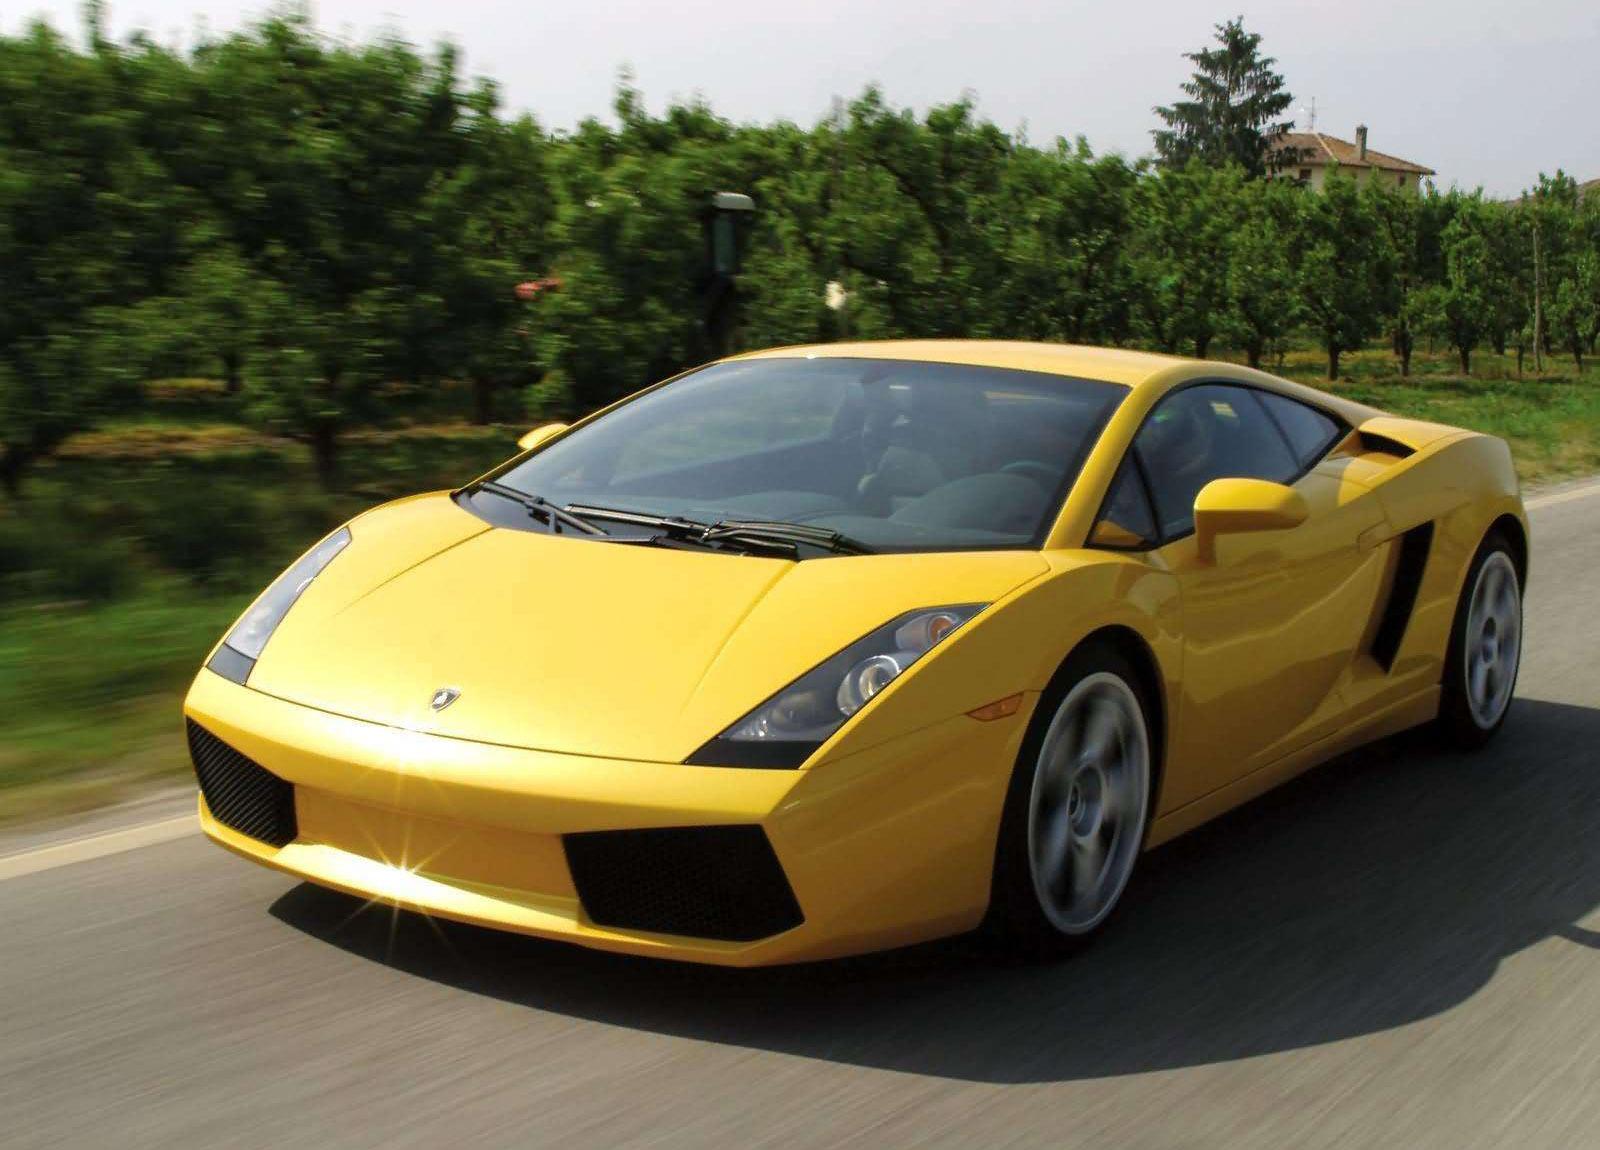 Superior 2003 Lamborghini Gallardo Thumbnail Photo 55177